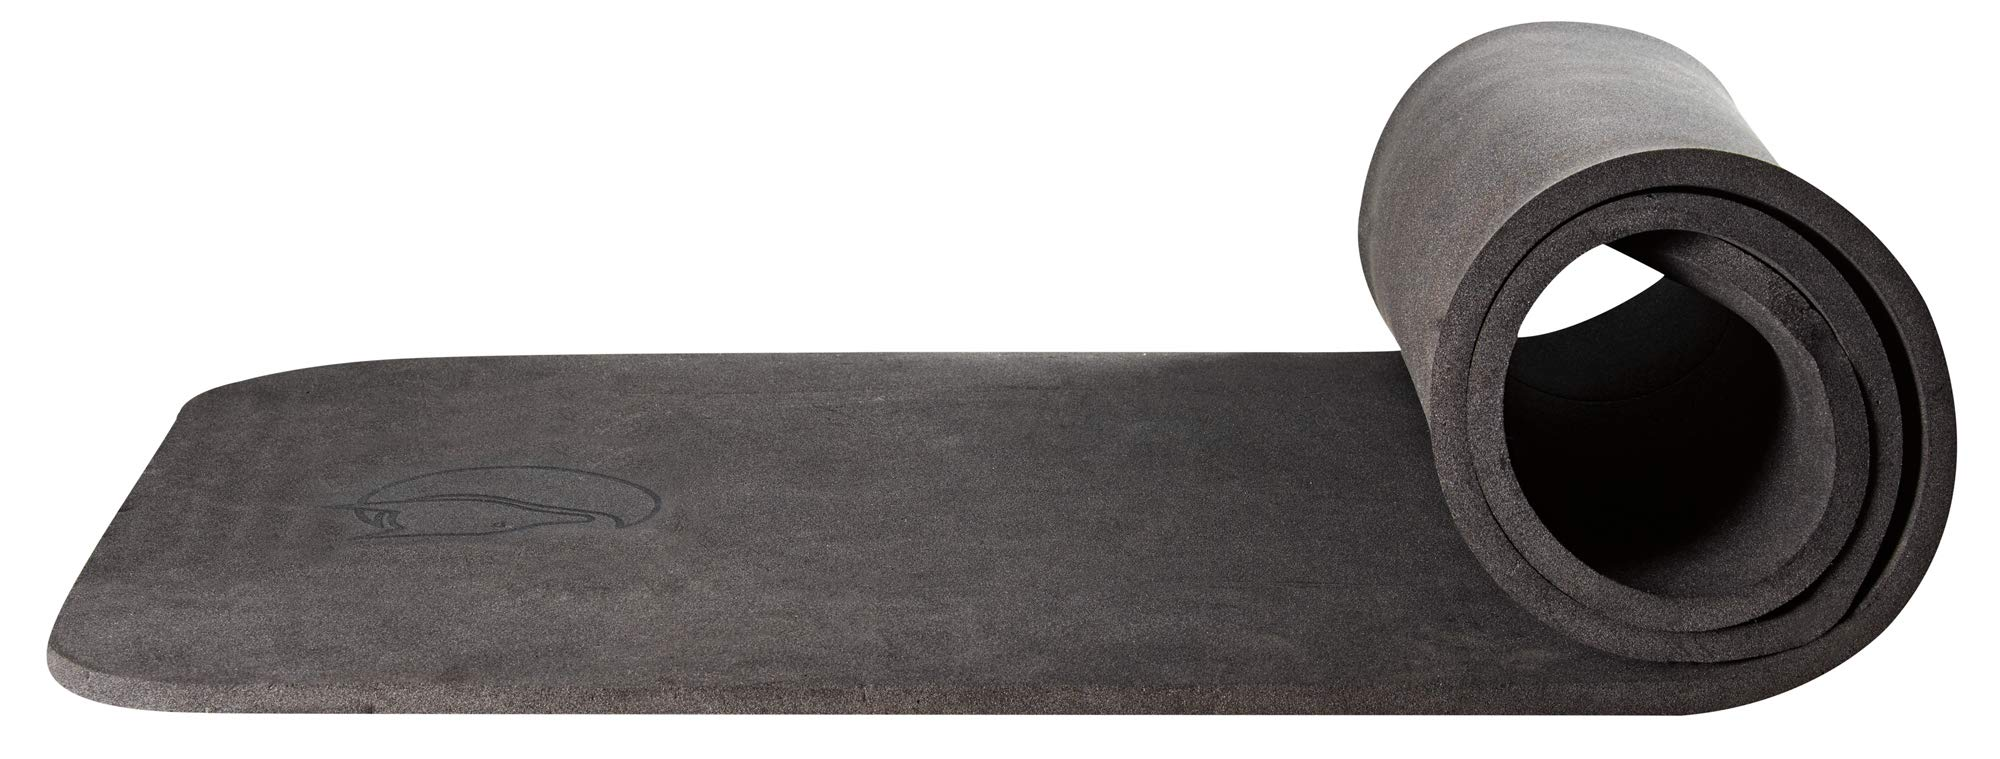 Fjällräven Unisex-Adult Ground Sheet 14 mm Isomatte, Black, 185 x 60 cm